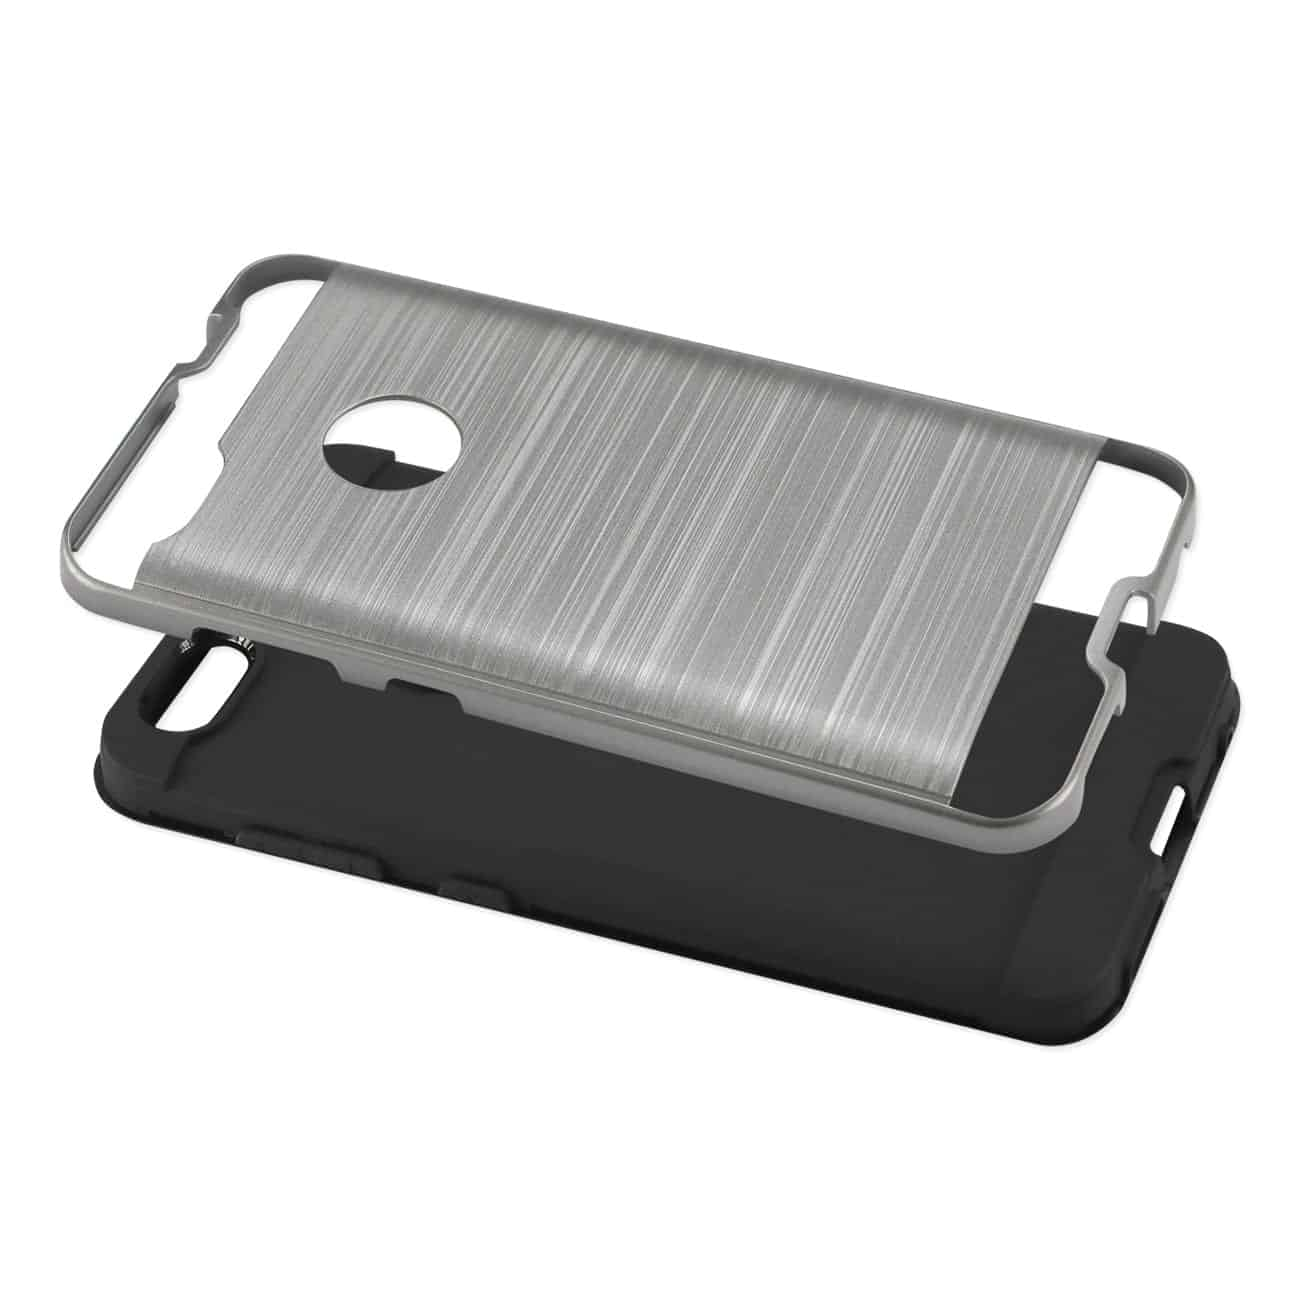 ZTE Blade X / Z965 Hybrid Metal Brushed Texture Case In Gray